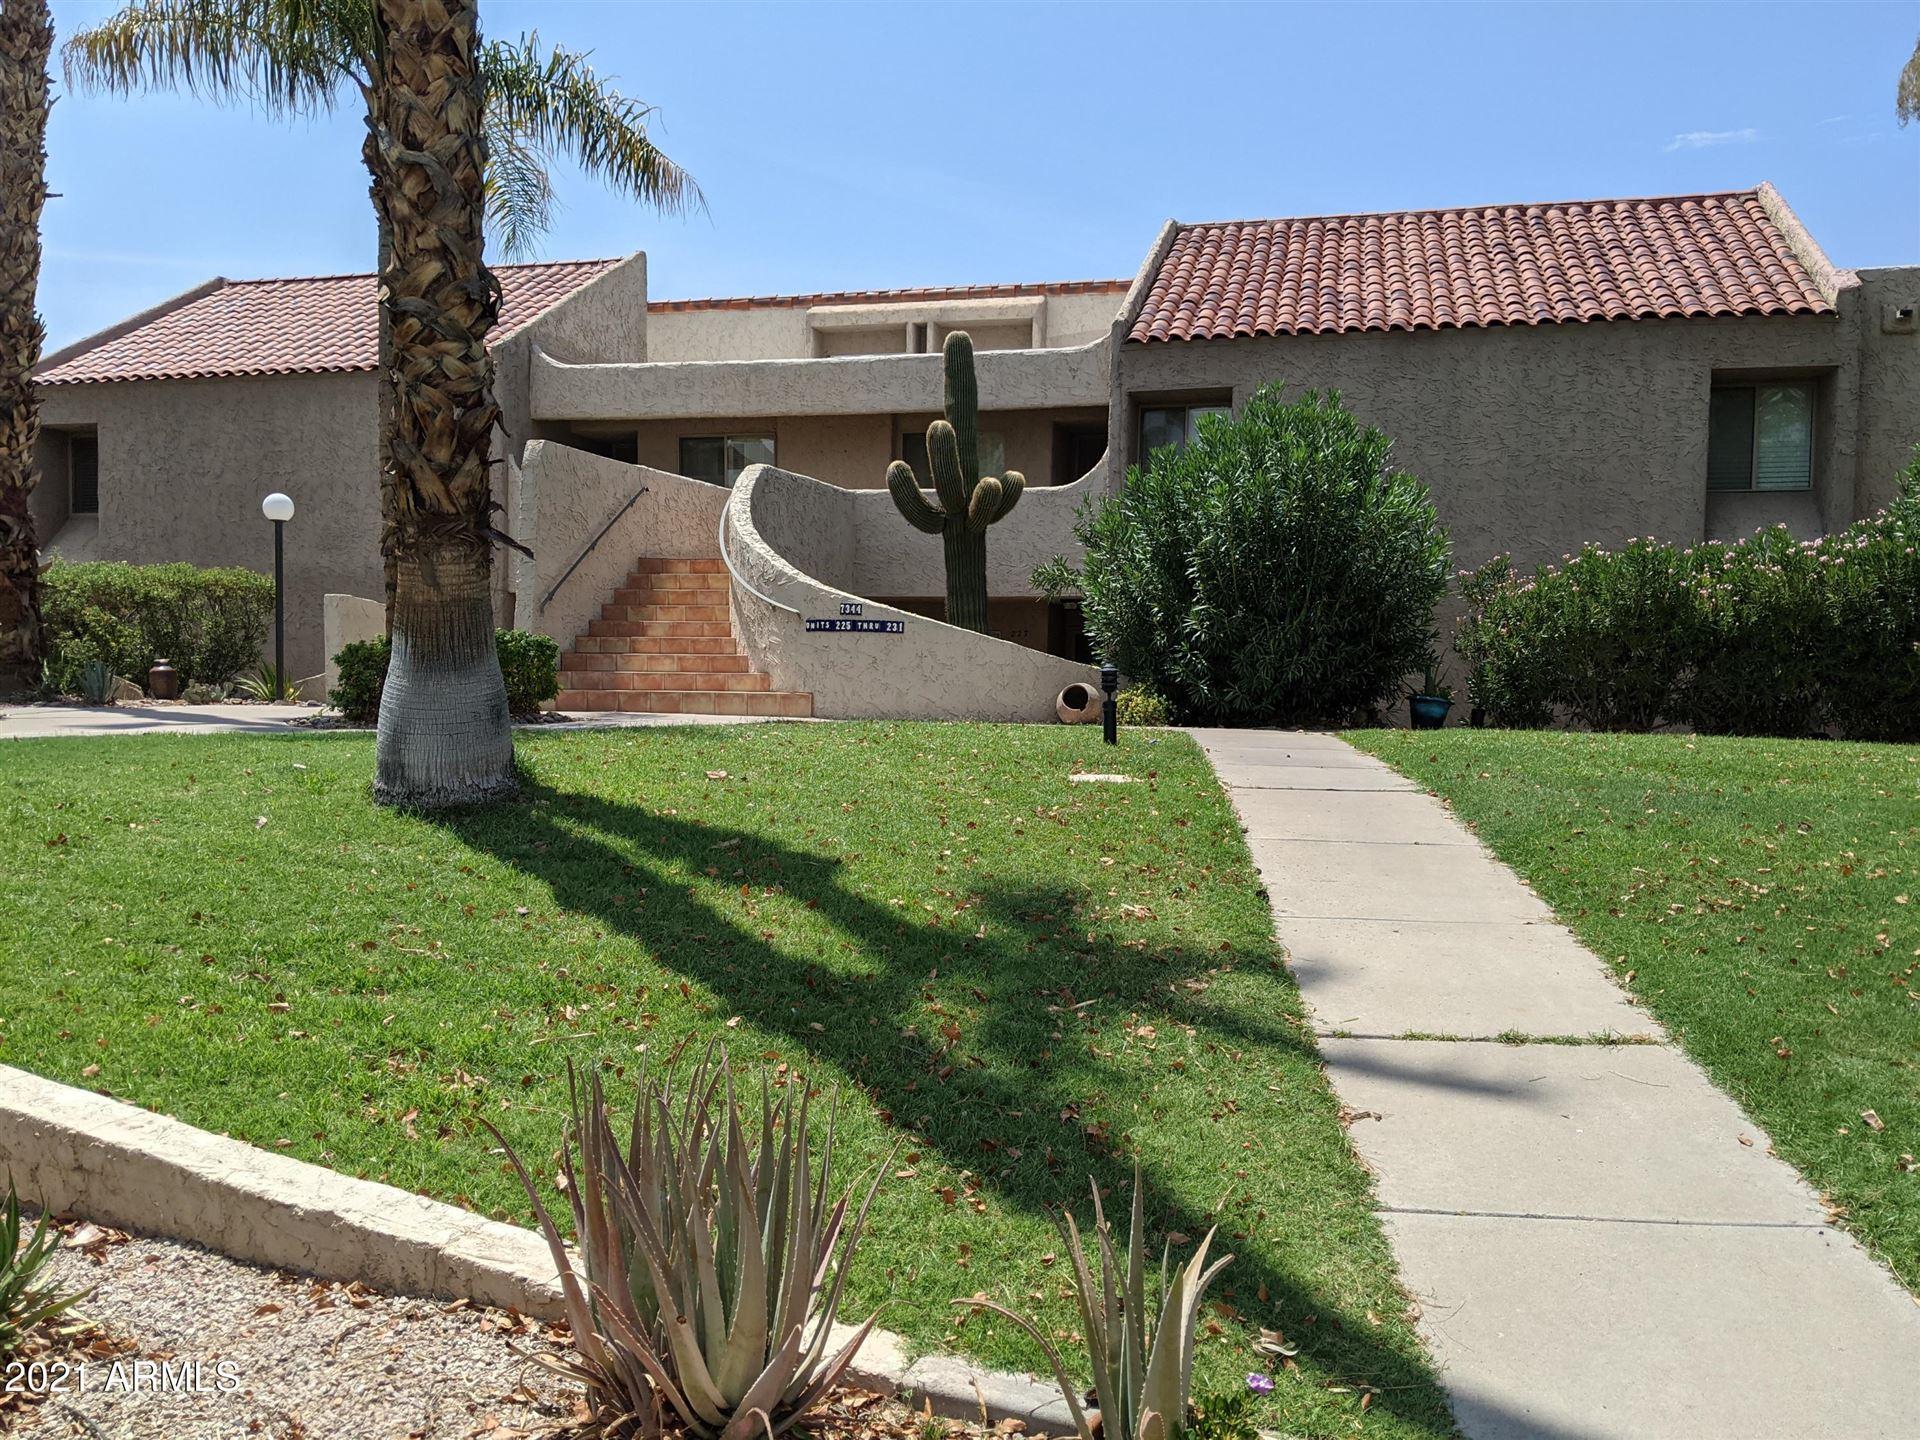 7344 N Via Camello Del Norte -- #227, Scottsdale, AZ 85258 - MLS#: 6264234